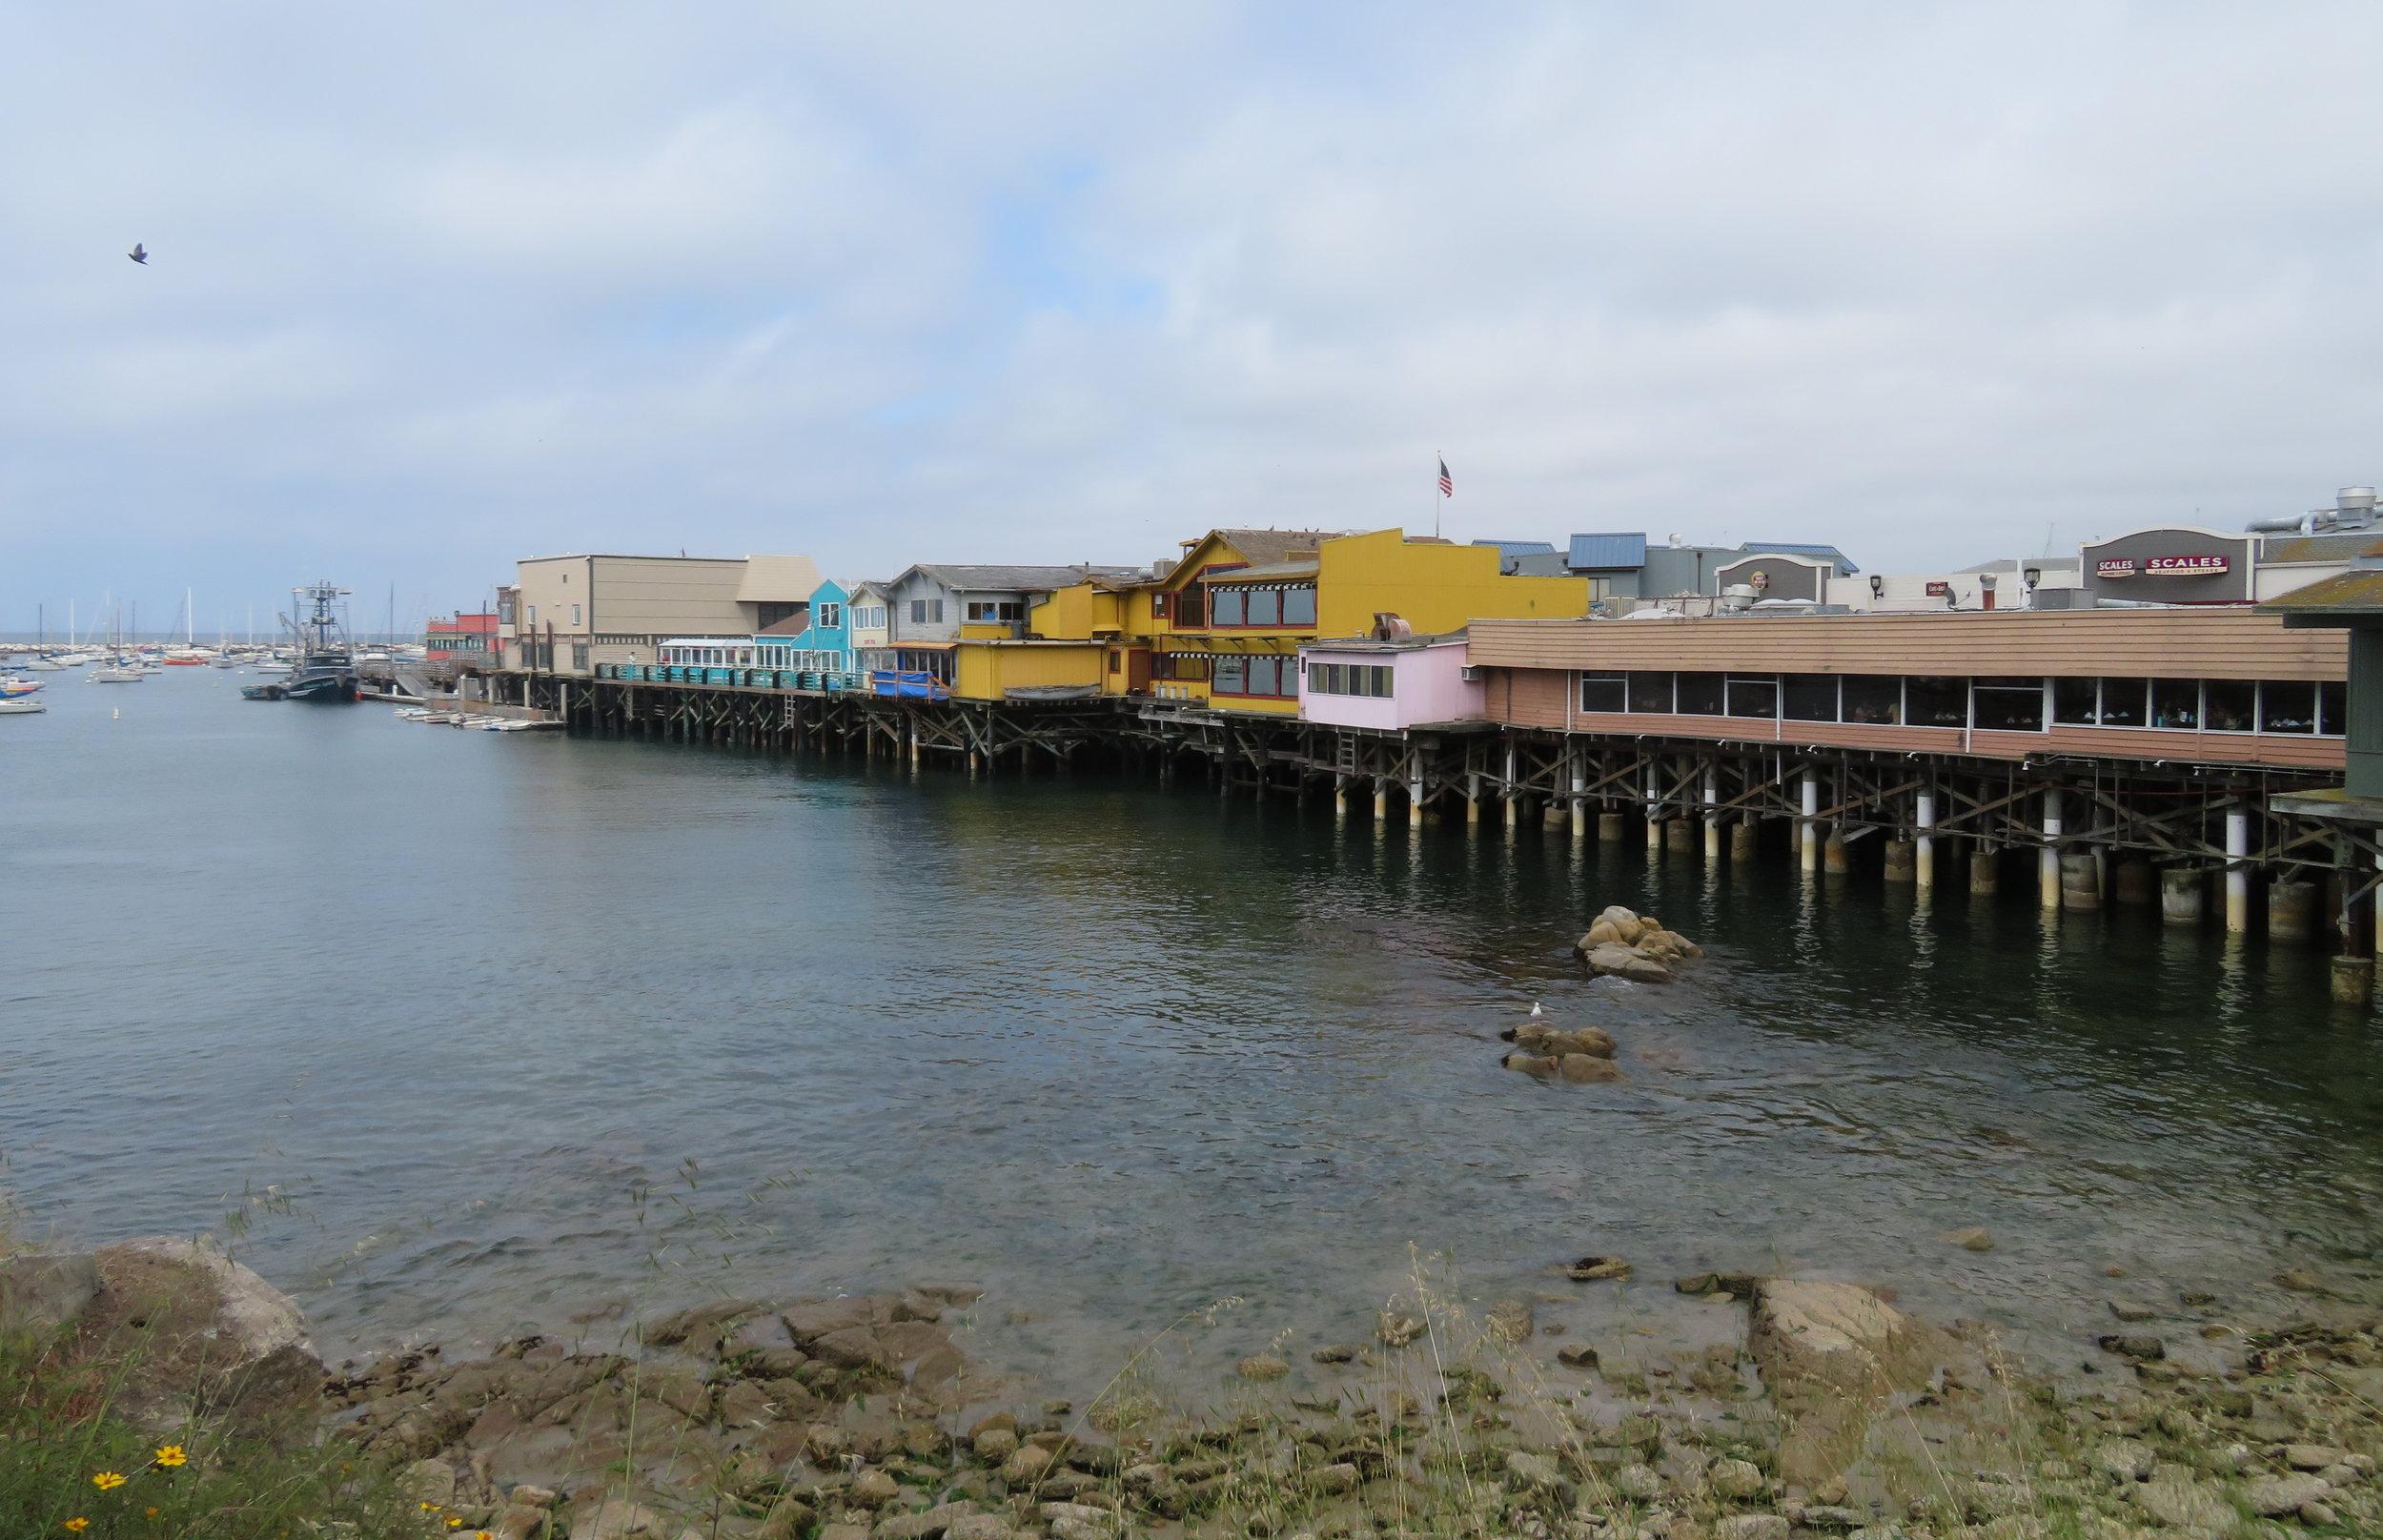 Fisherman's Wharf from the Coastal Trail